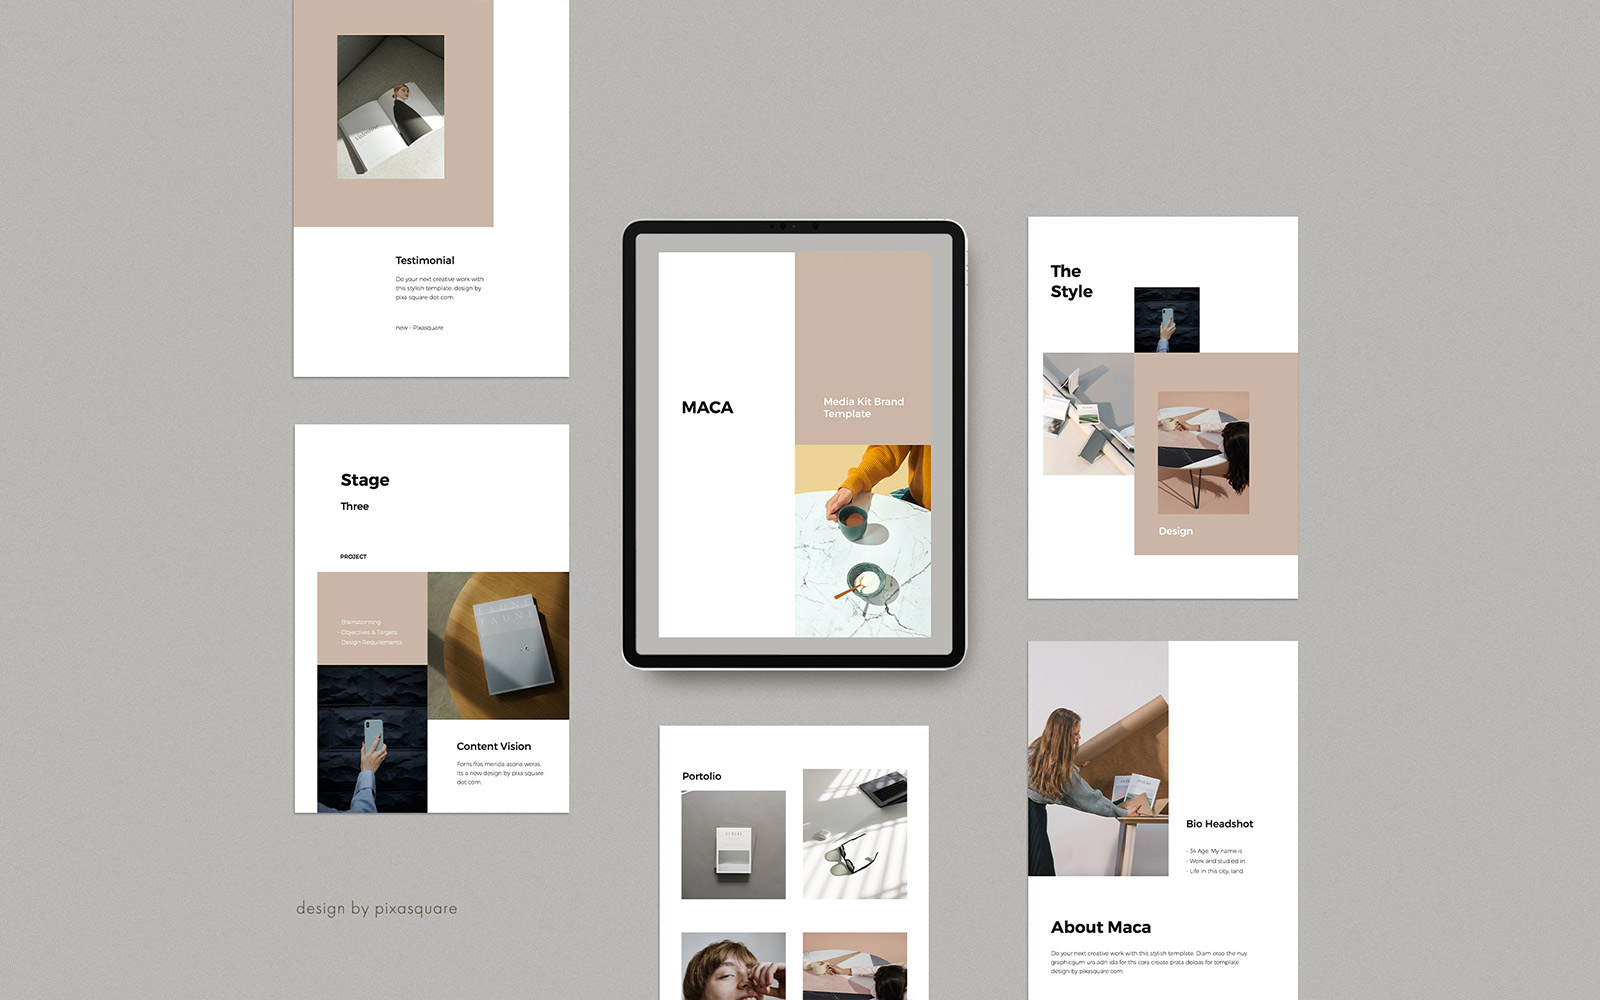 MACA - A4 Vertical Media/Press Kit Google Slides